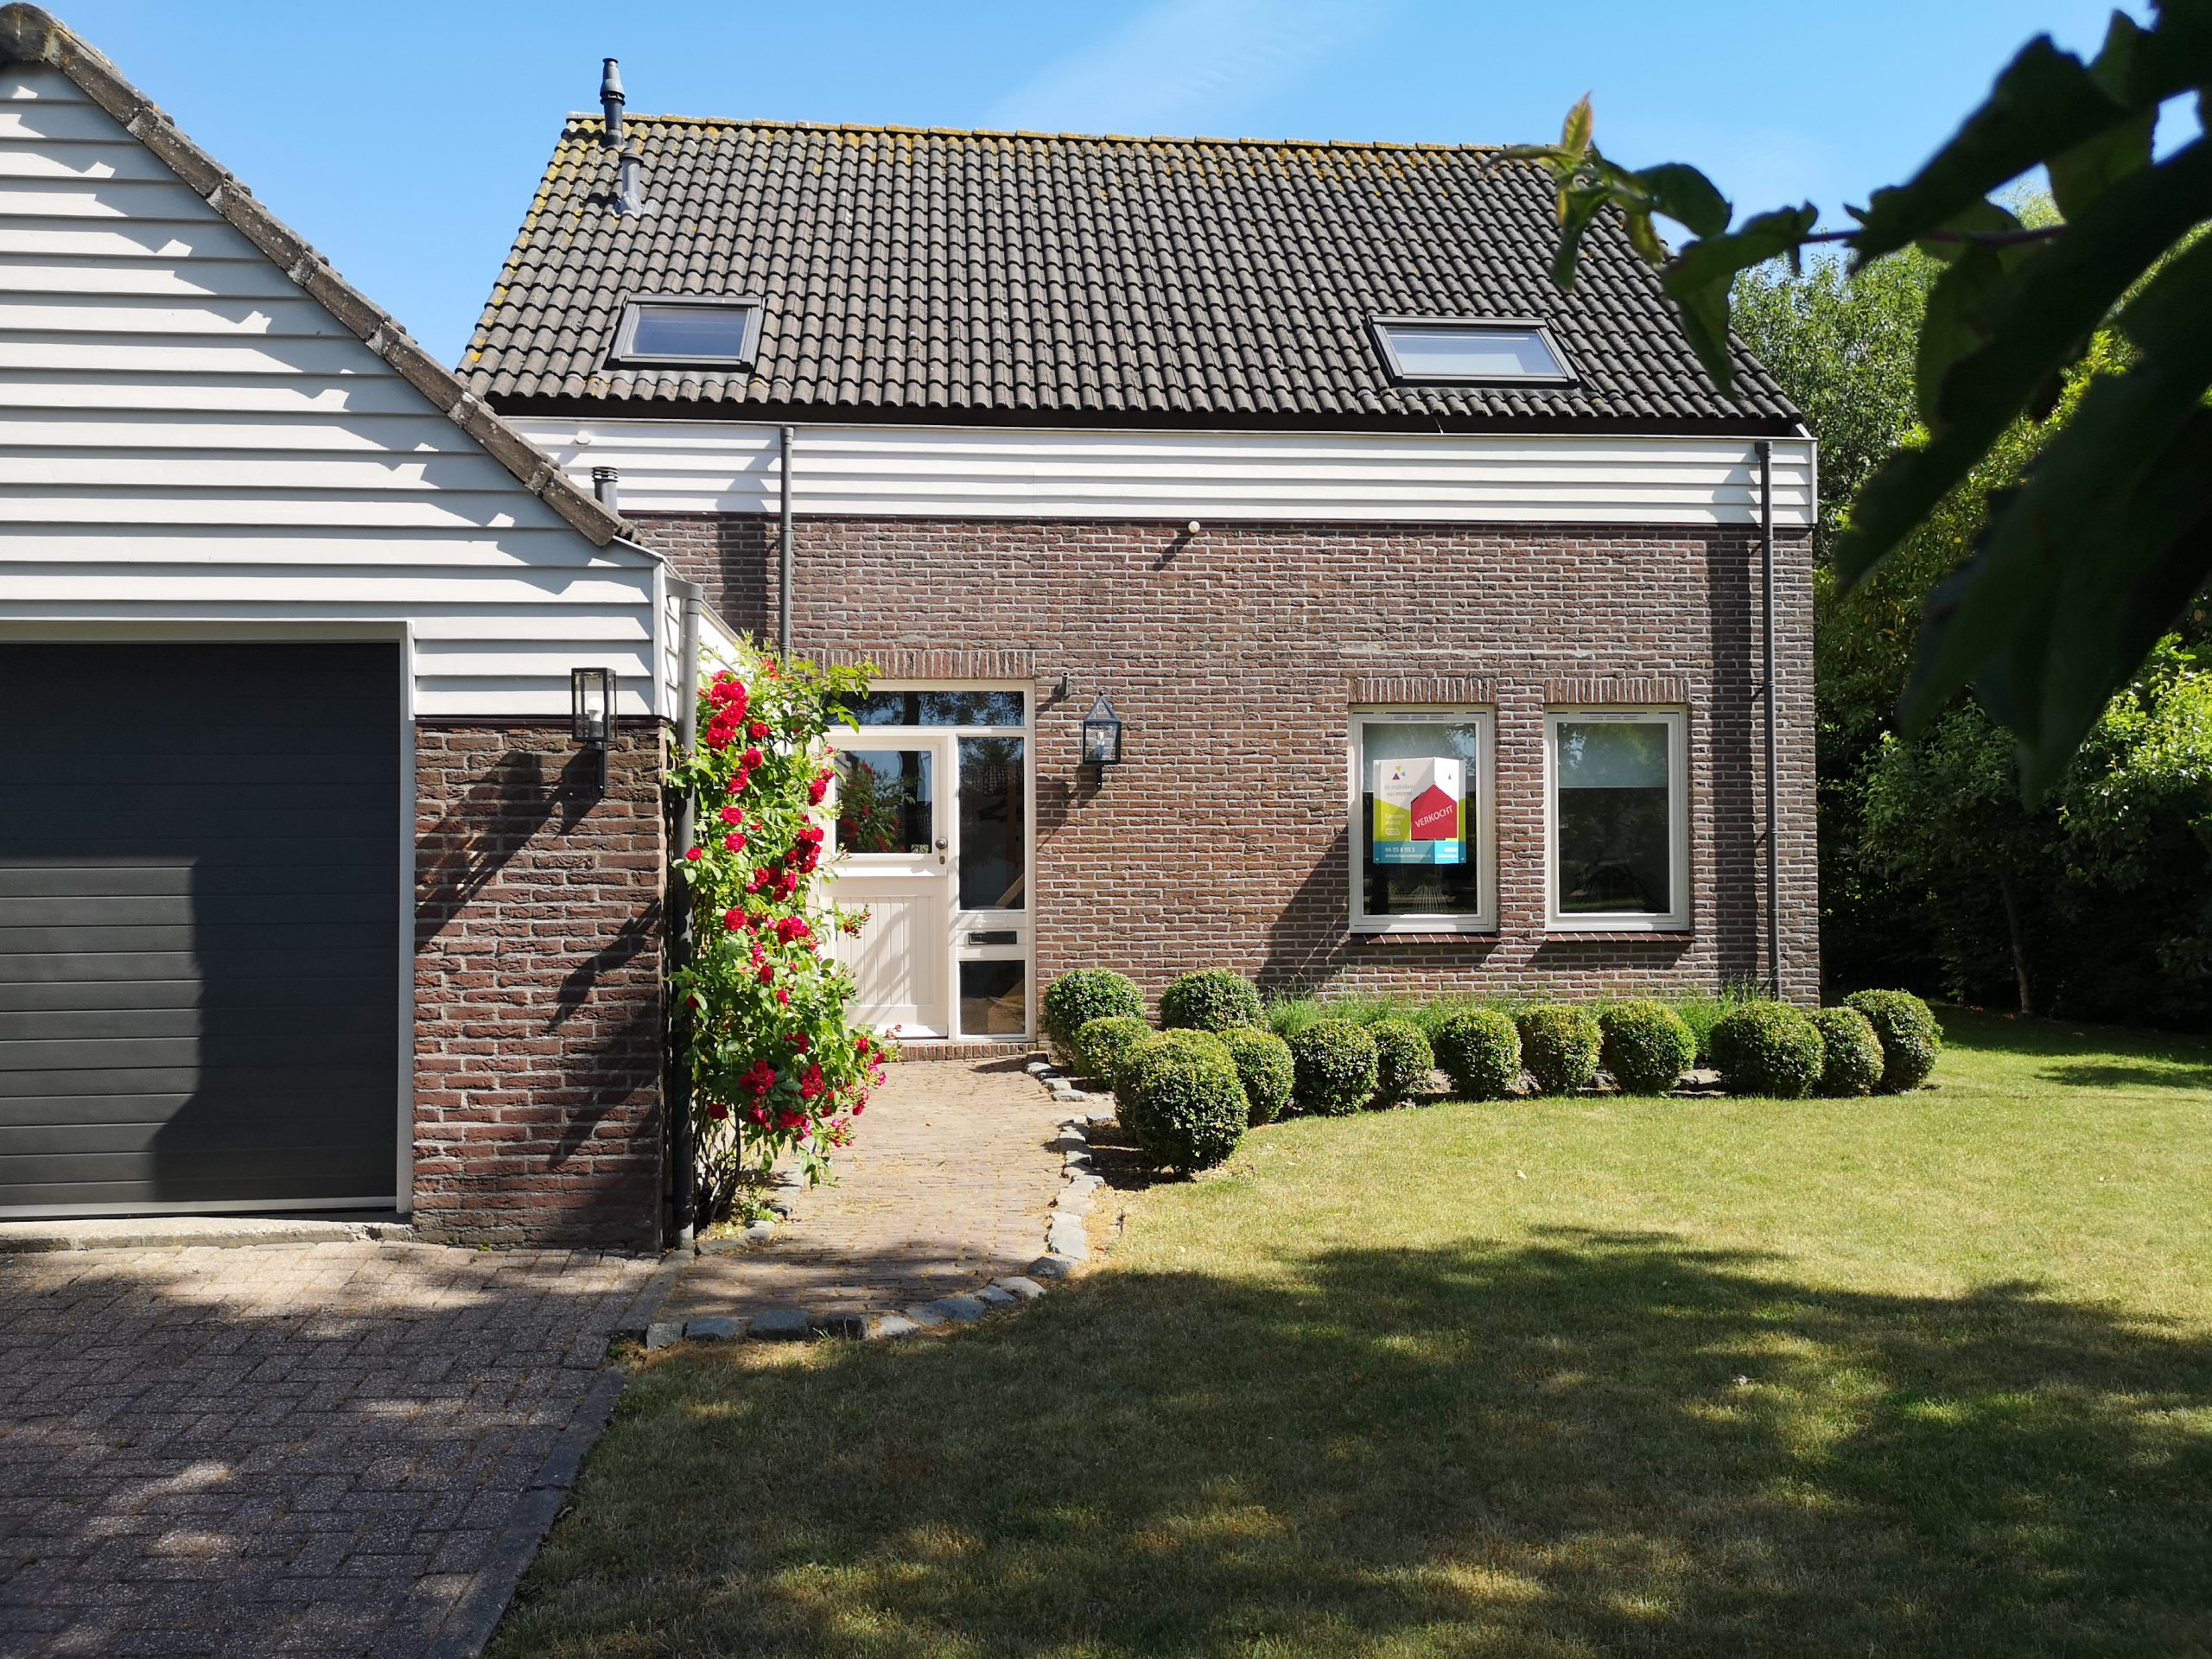 Loensweg 3 Nieuwerkerk